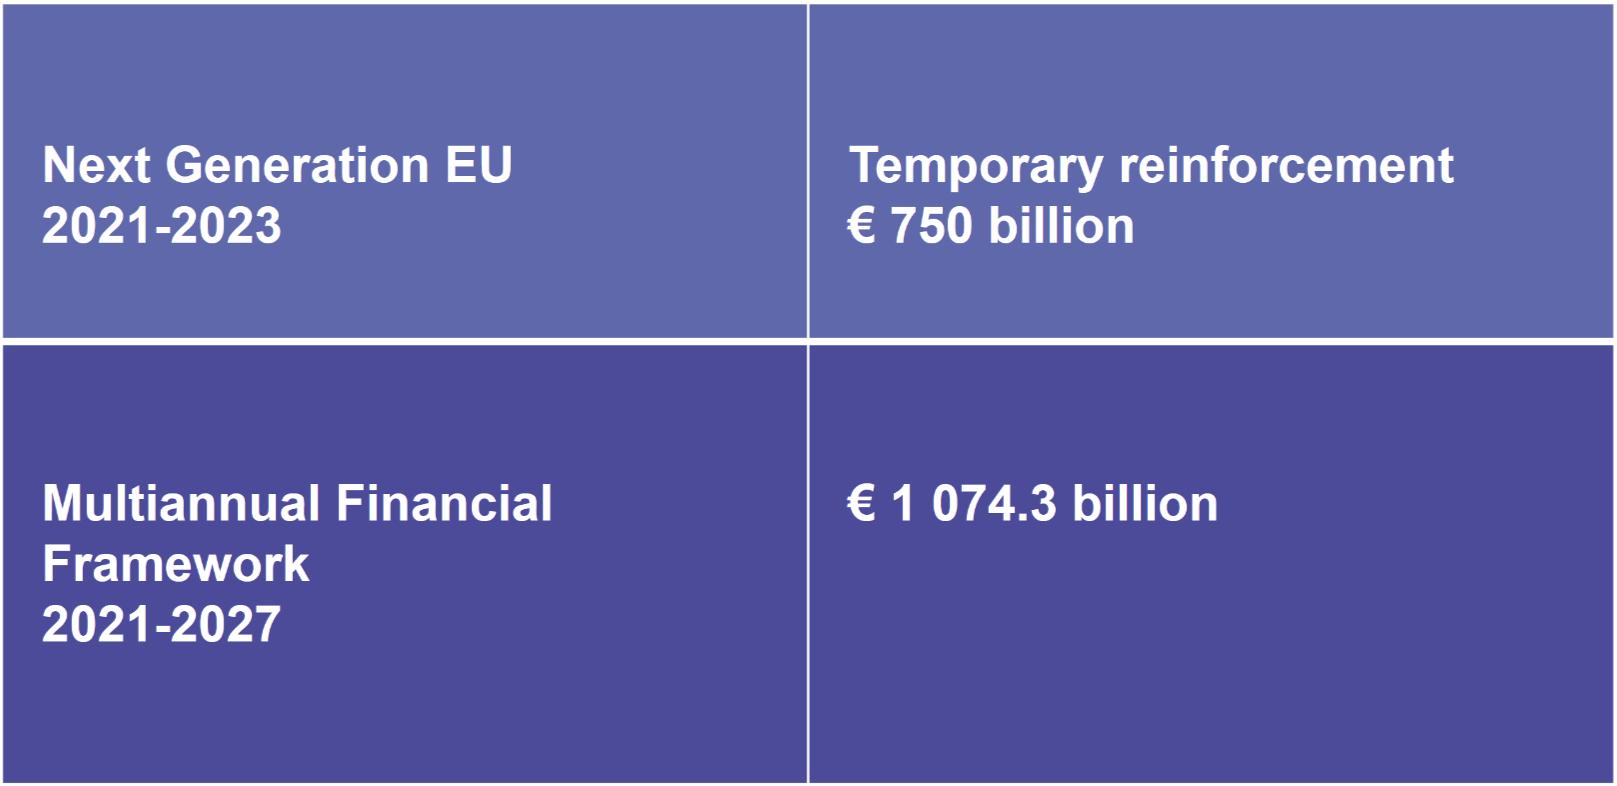 2021-2027-next-generation-eu-figures